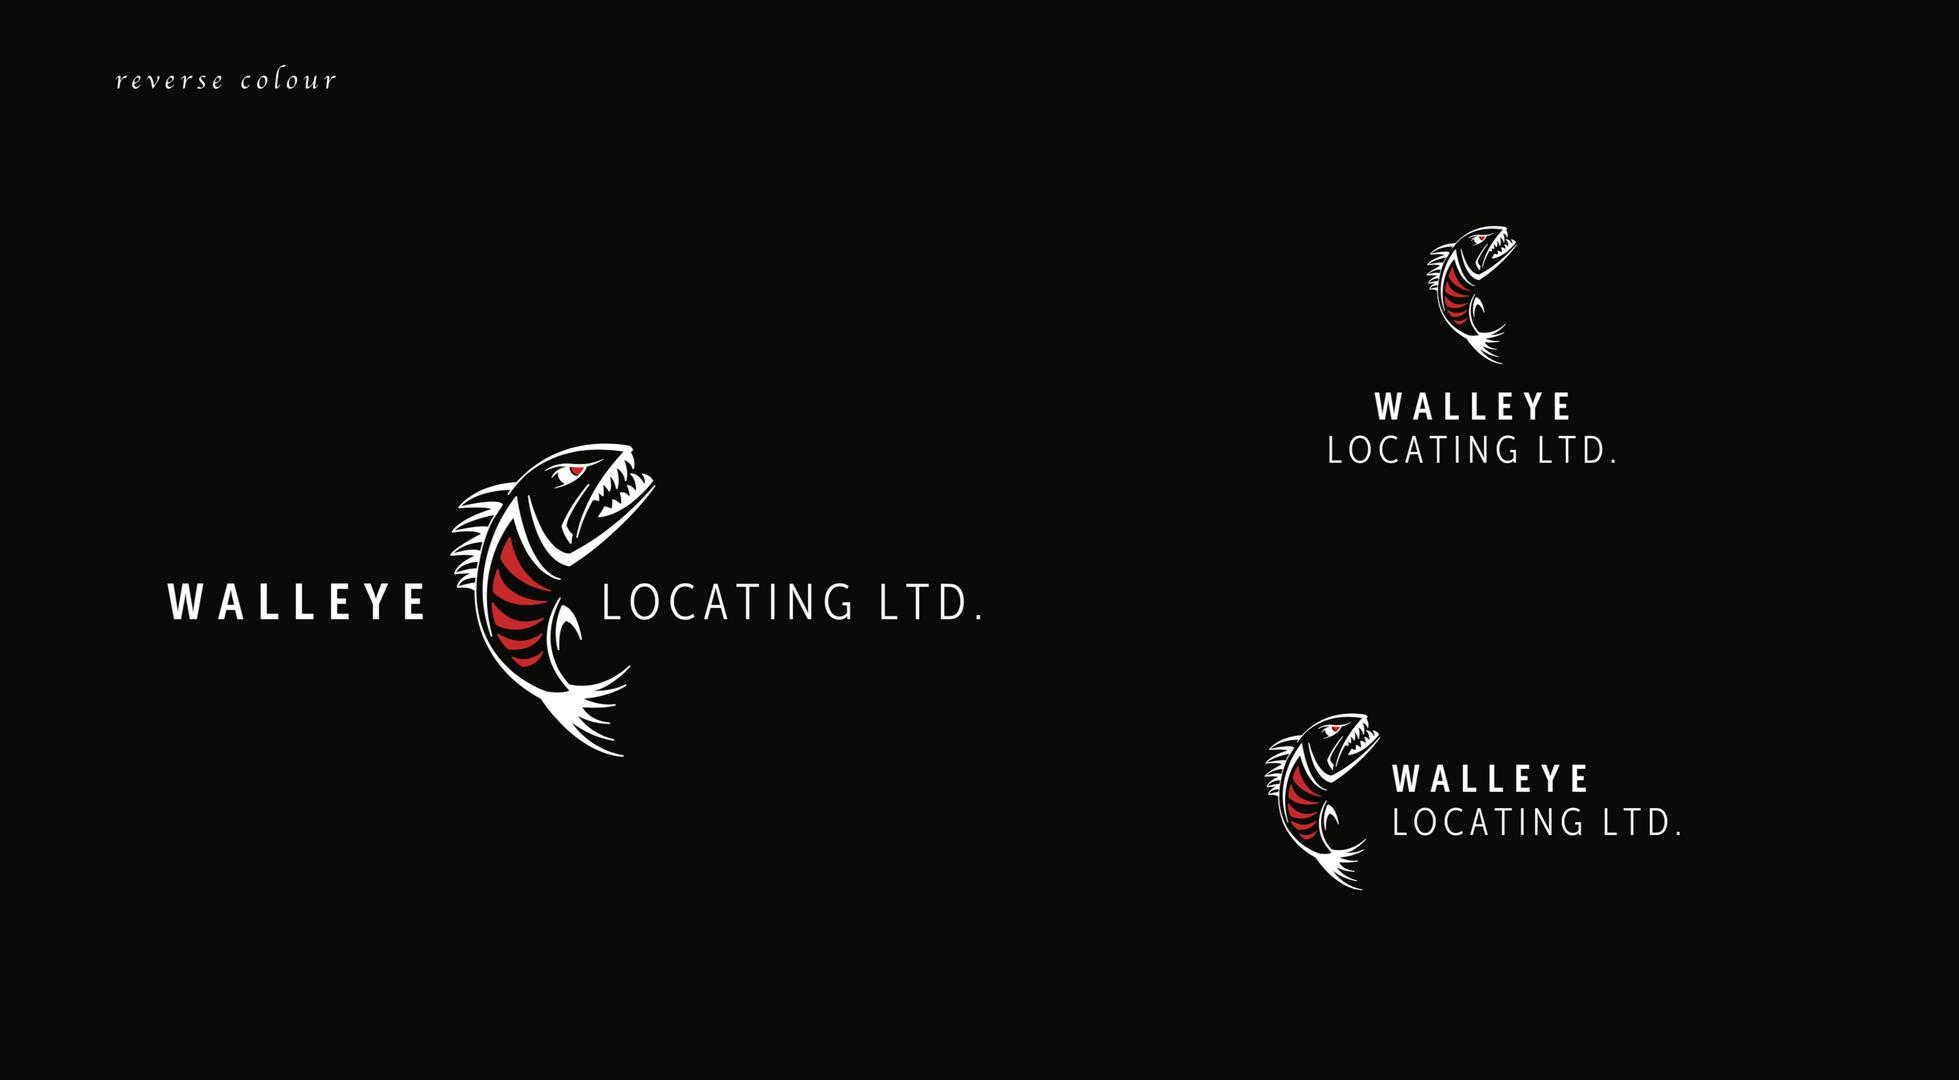 walleye_locating_logo_black.png